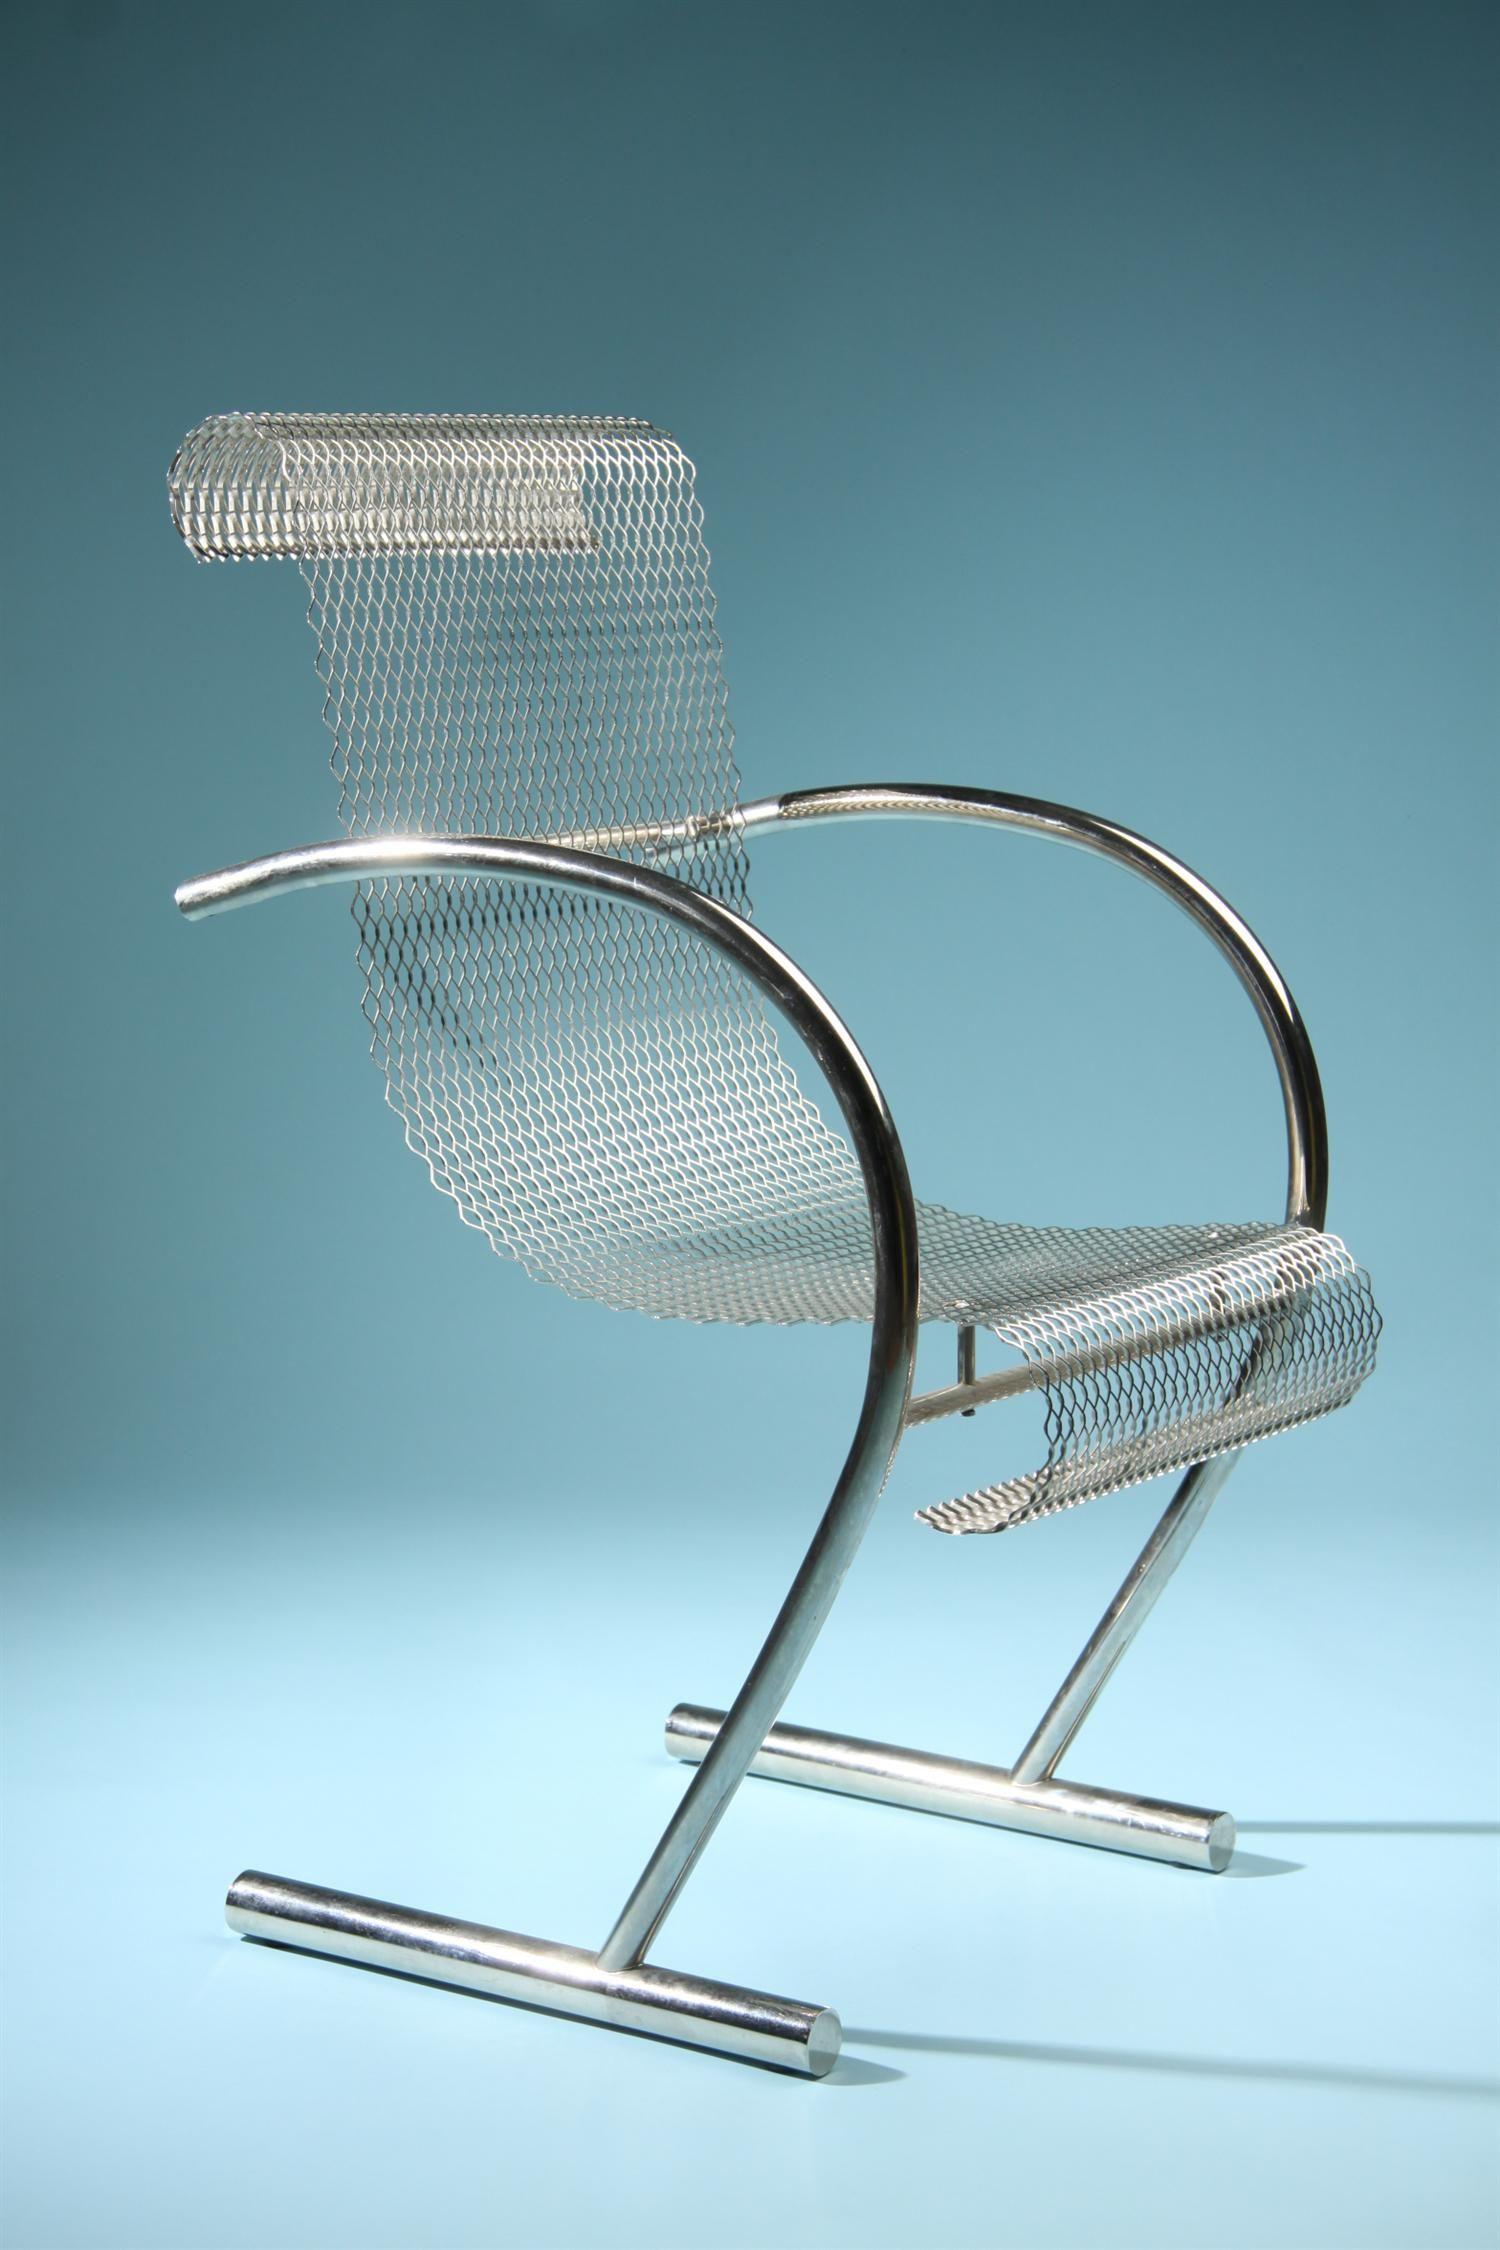 Designed By Shiro Kuramata For XO, France. 1985